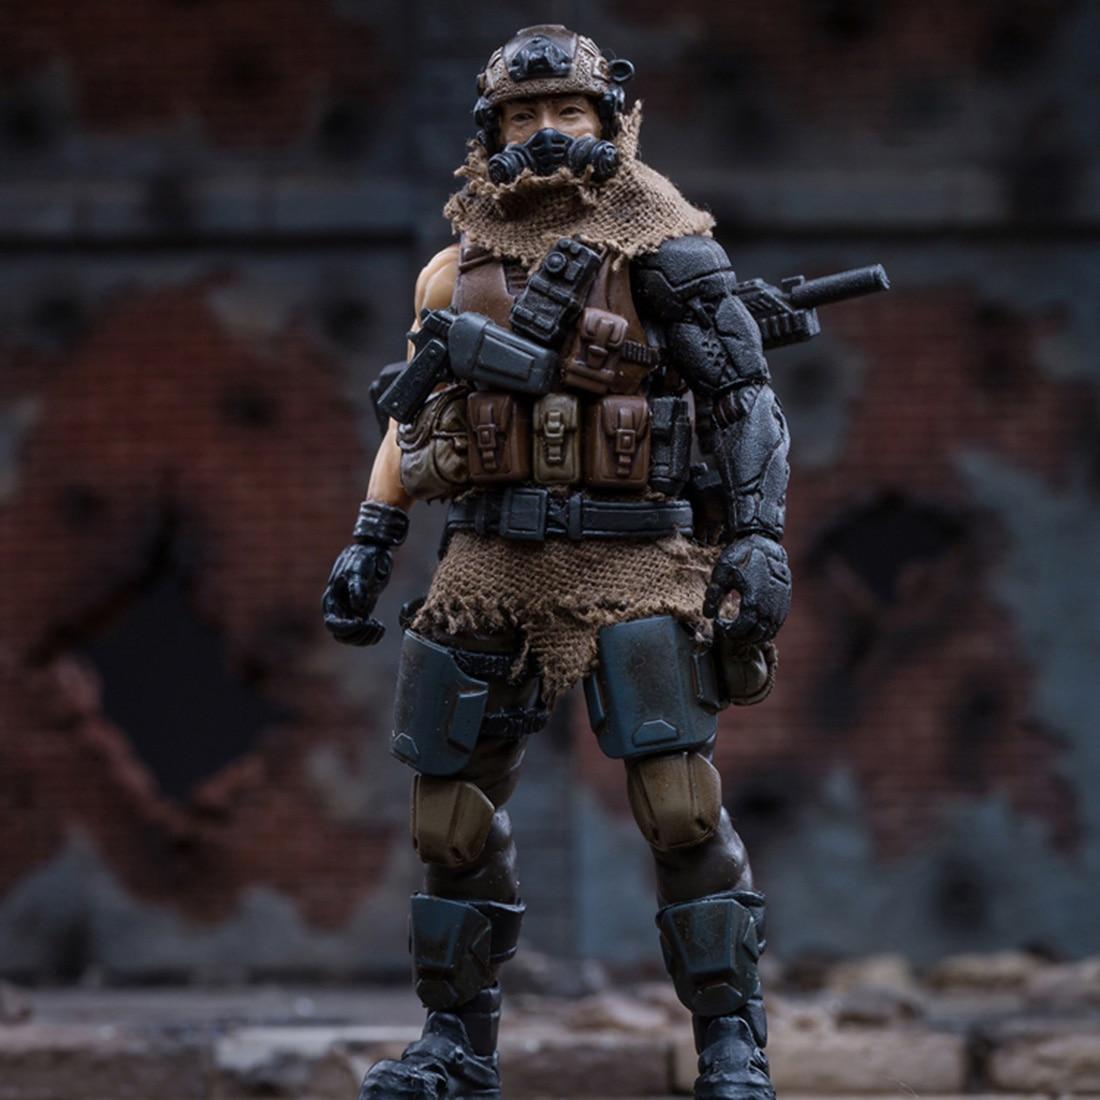 10cm 1/18 Lifelike Soldier Model With Equipment 3D West Asian Mercenary Legion DIY Assembly Fine Soldier Model Creative Toy